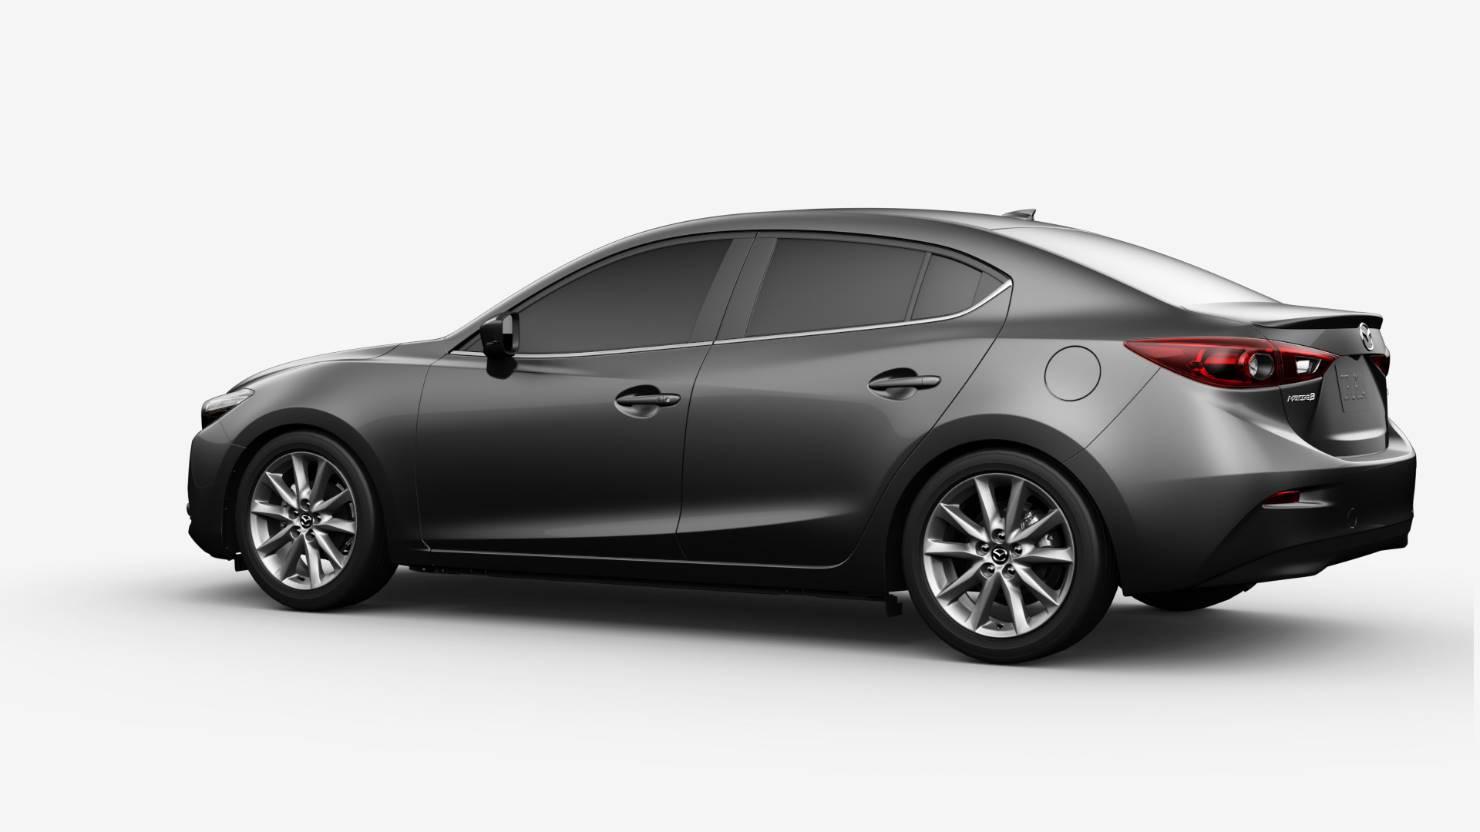 2017 Crosstrek Limited >> Mazda 2 2018 Drive Together | Autos Post